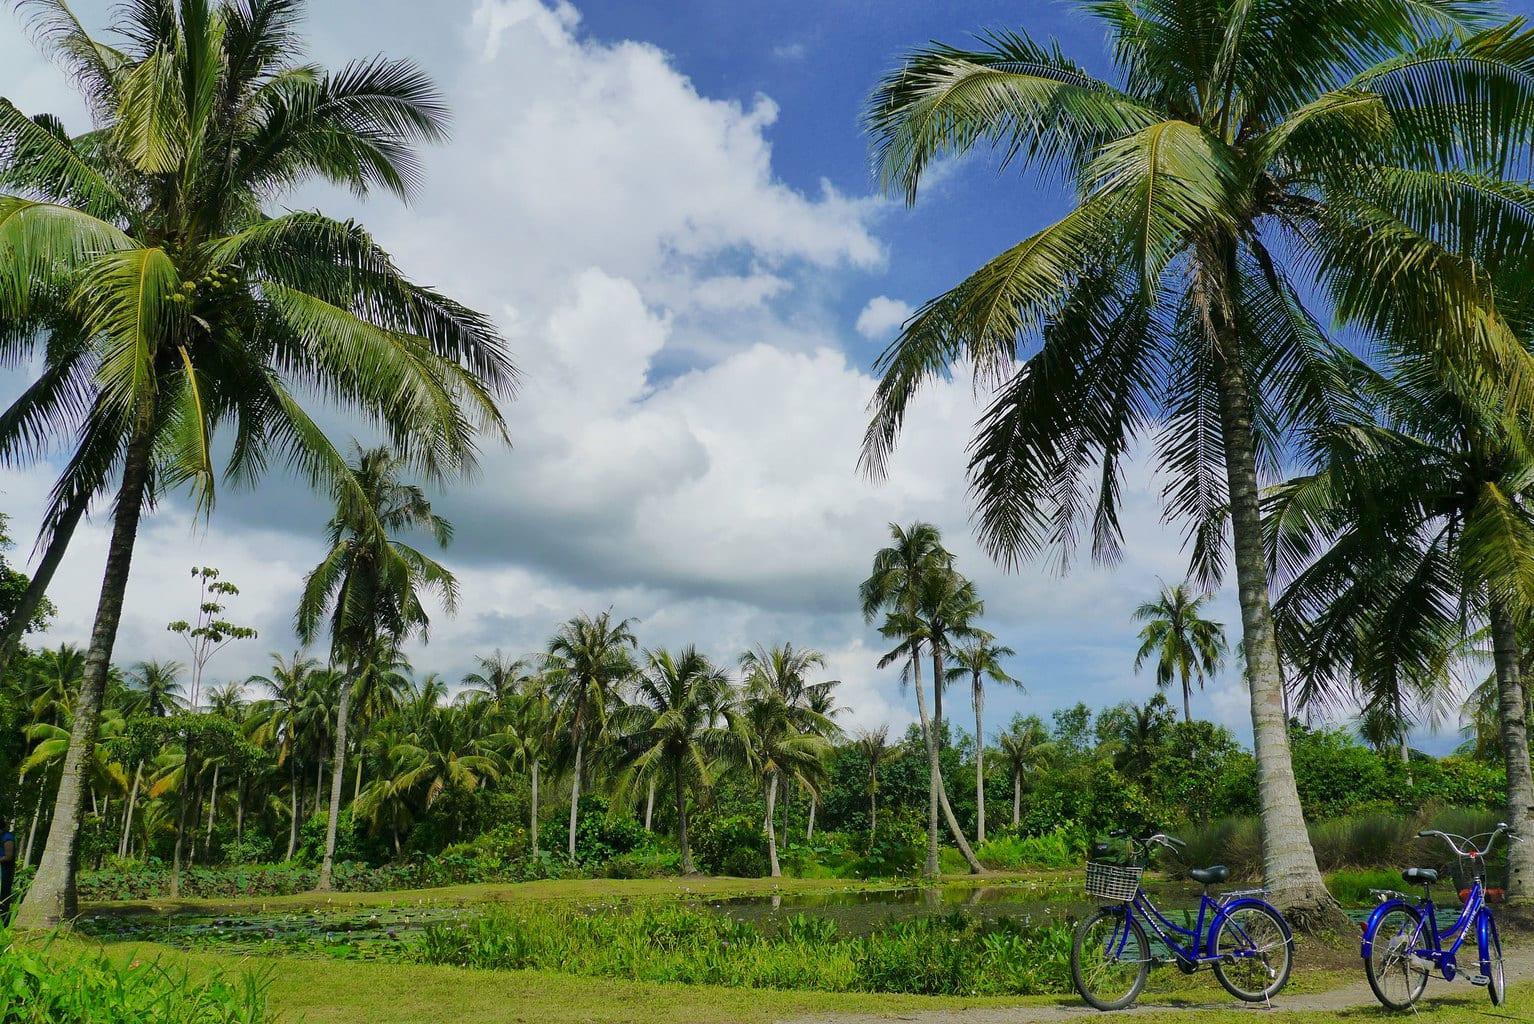 Getting around by bike on Pulau Ubin